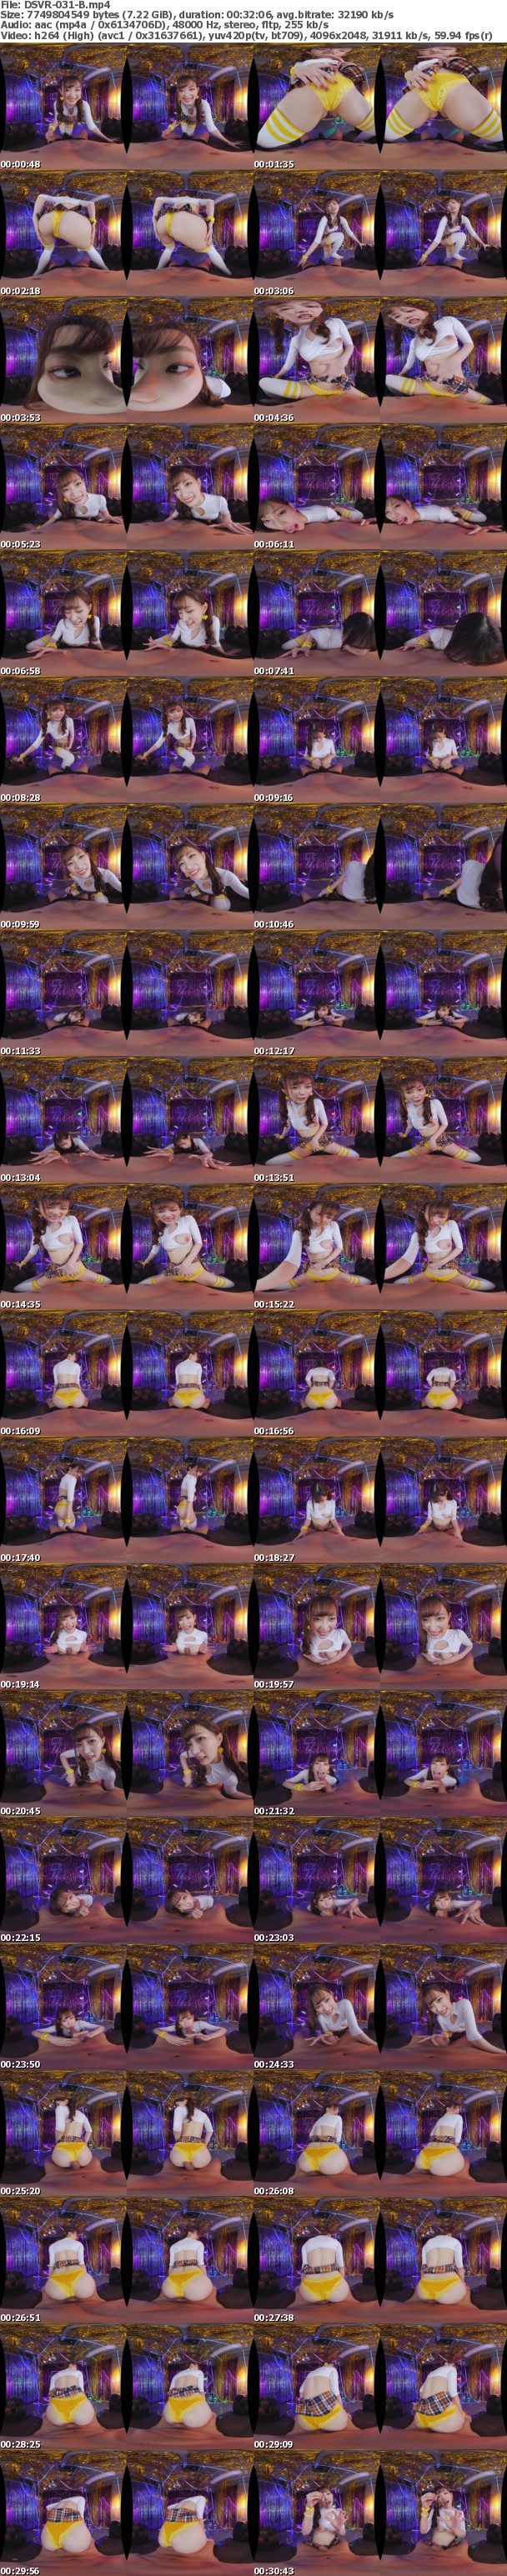 (VR) DSVR-031 目の前でお尻丸見え腰振り騎乗位SEX 美谷朱里